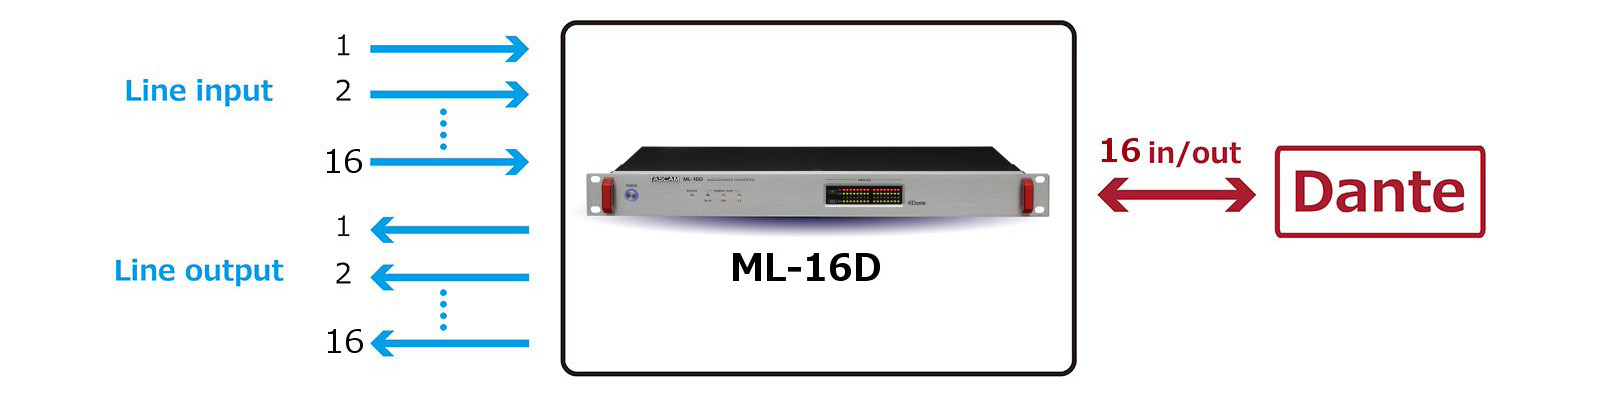 ML-16D